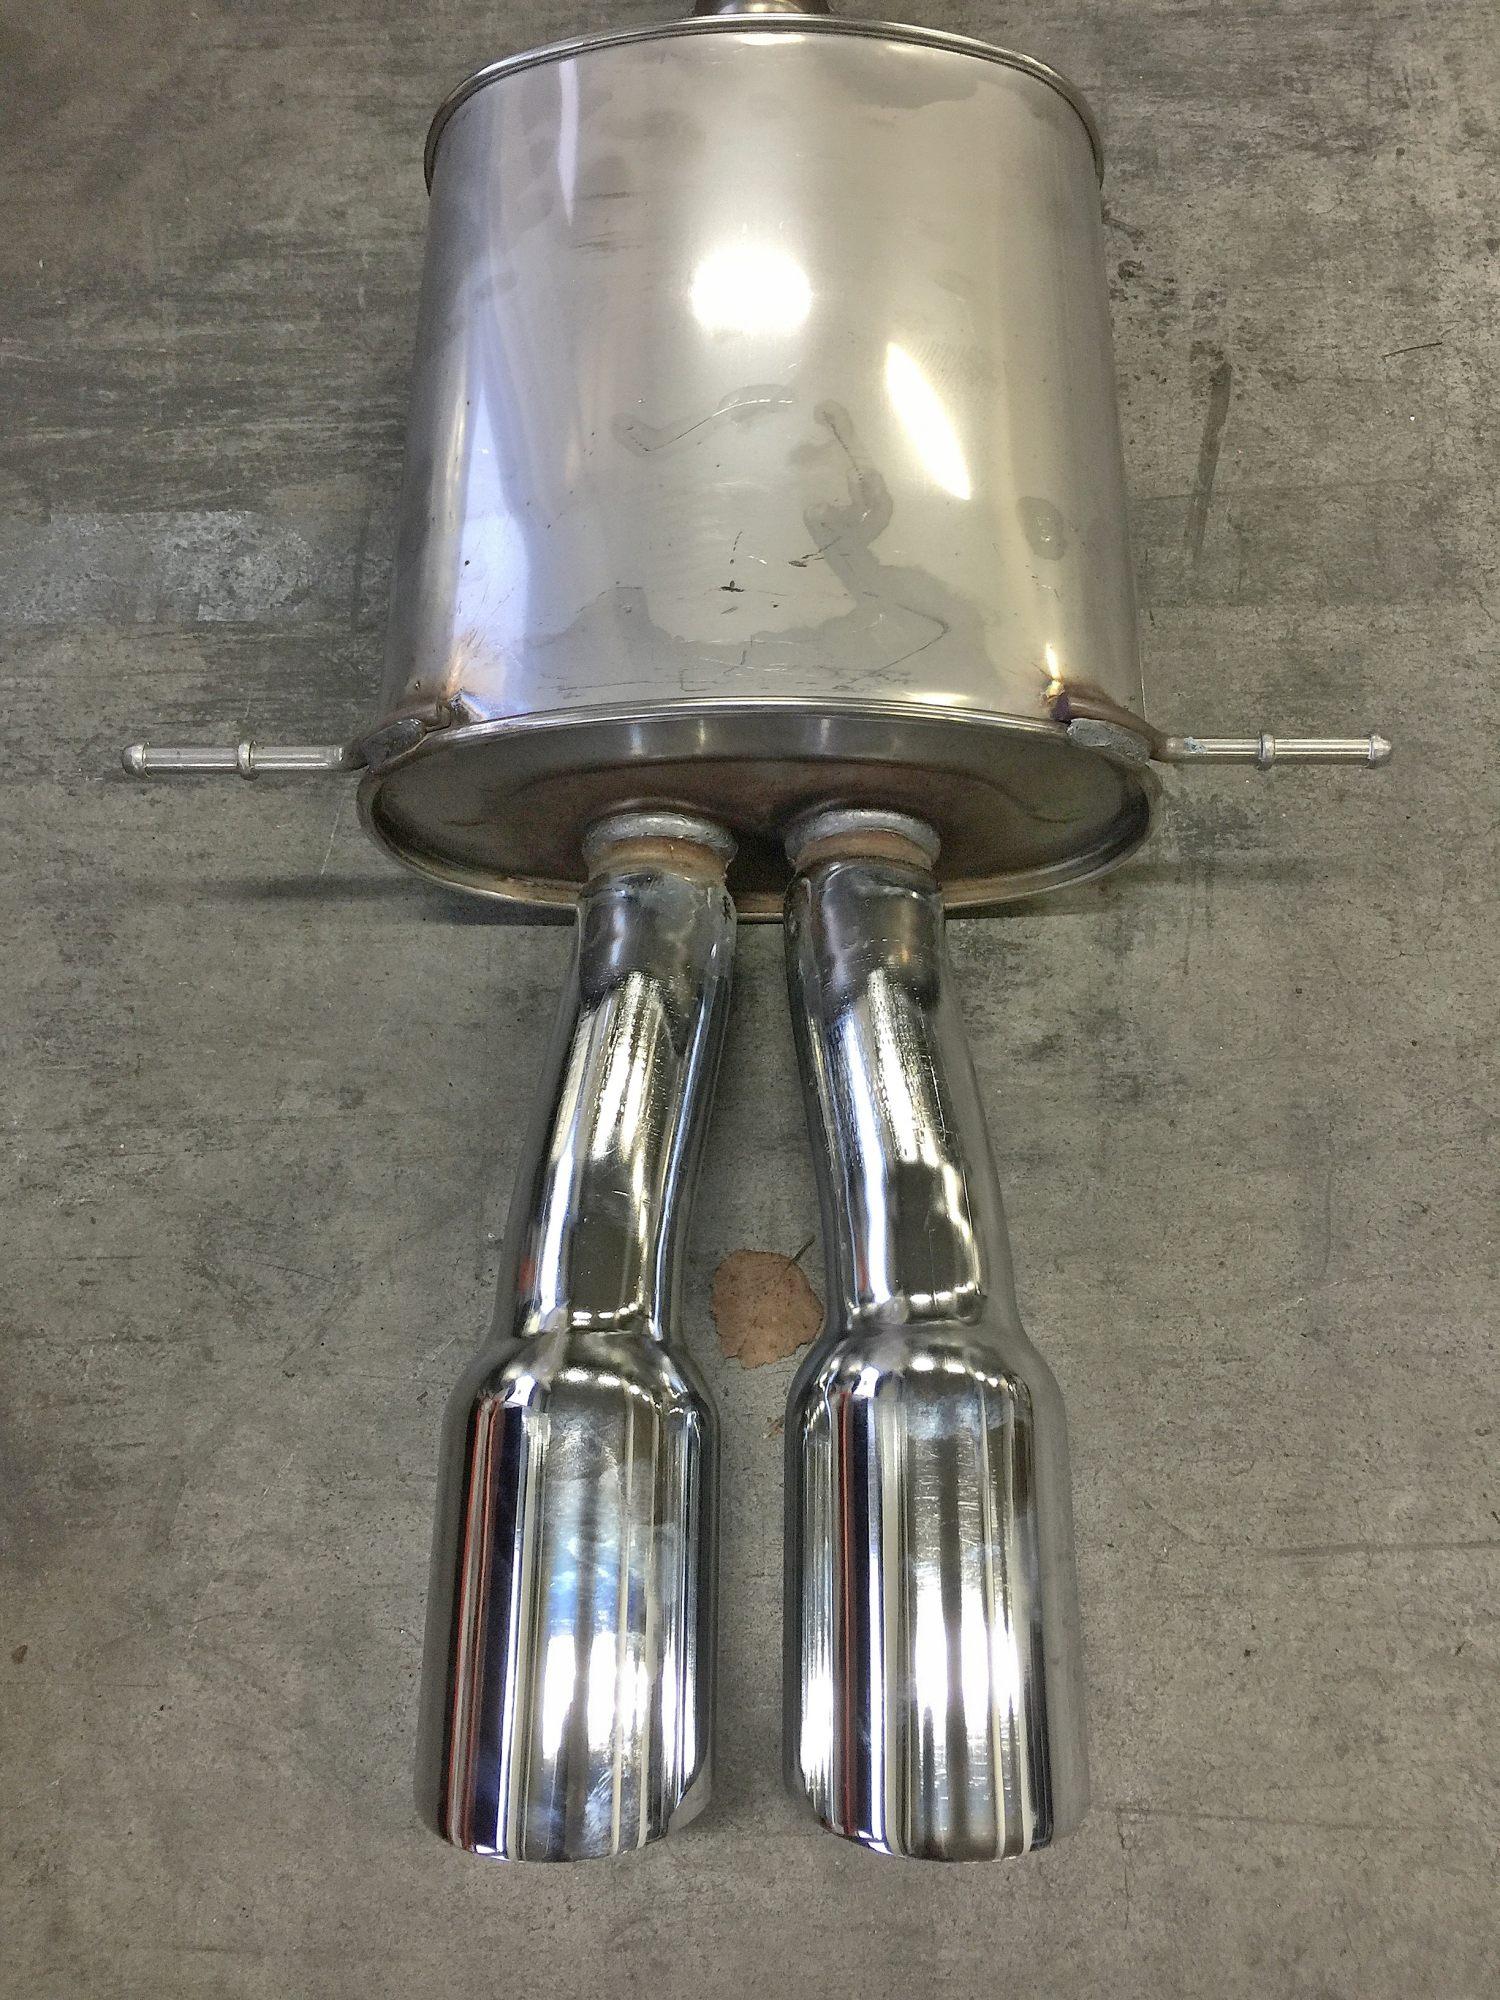 Elferbasede Jcw Werks Works Endschalldämpfer Mini Cooper S Inkl